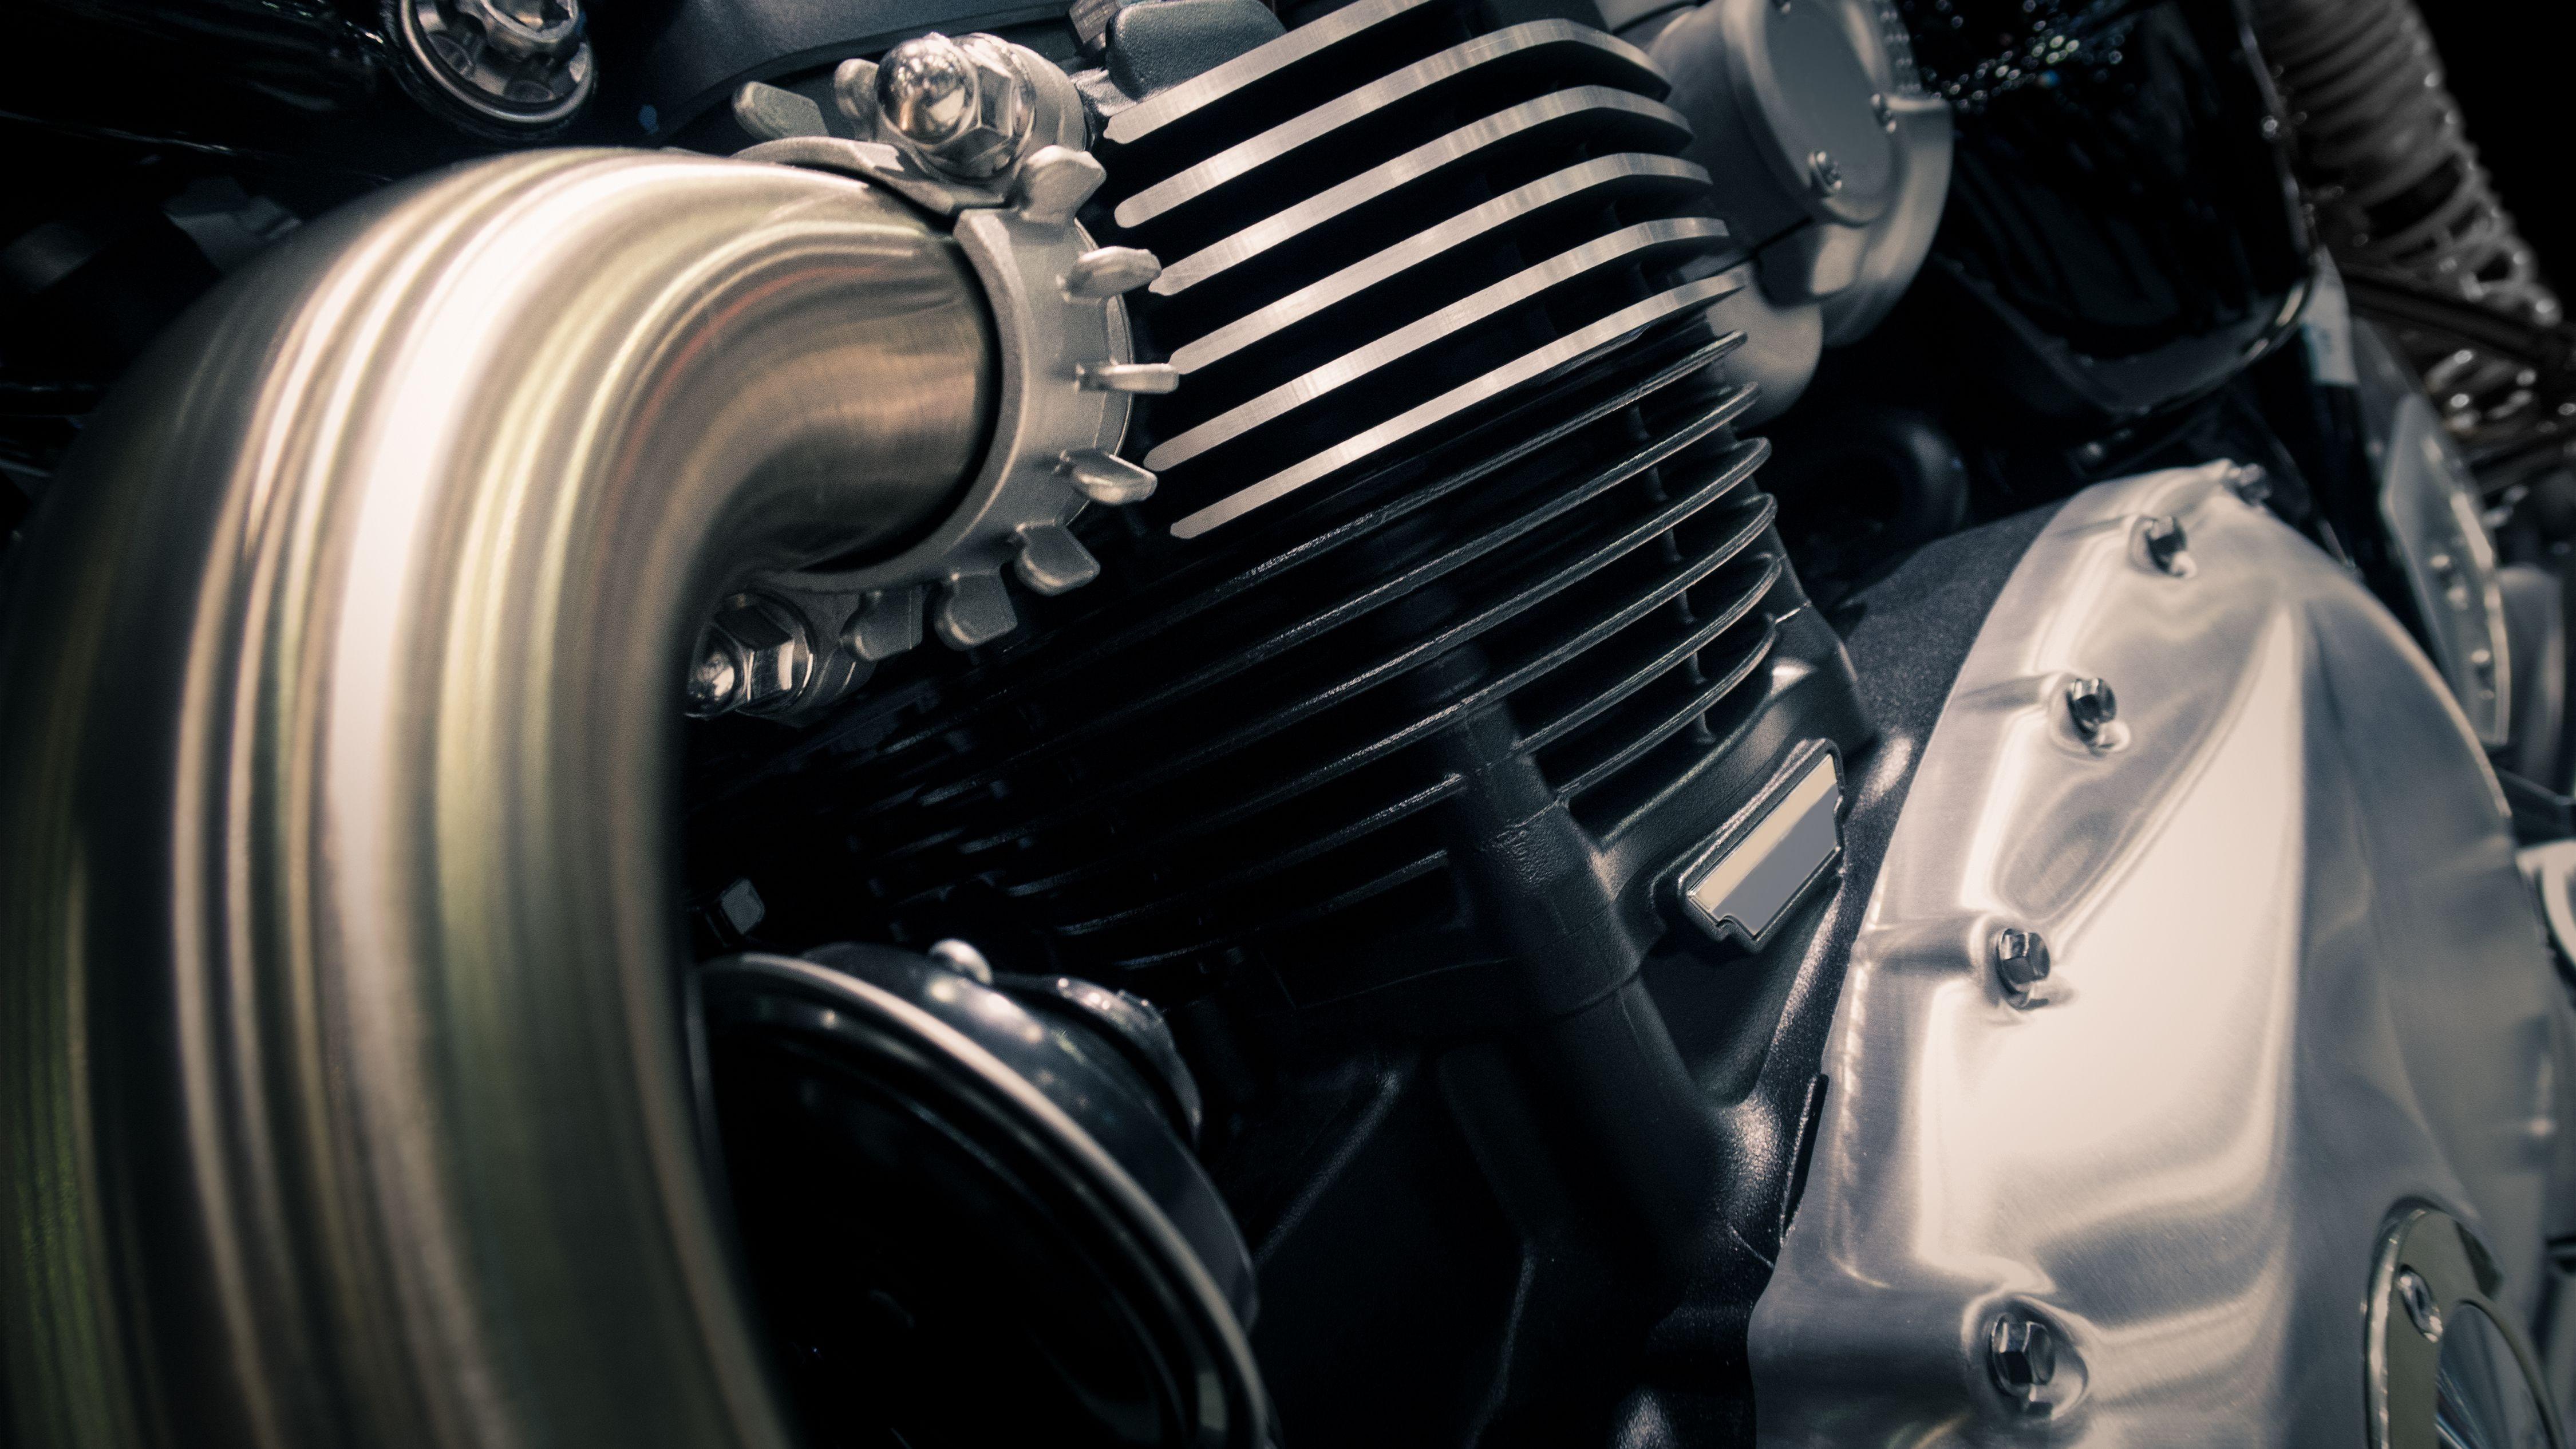 4 Stroke Dirt Bike Engine Diagram Reasons for A Motorcycle Not Starting Of 4 Stroke Dirt Bike Engine Diagram